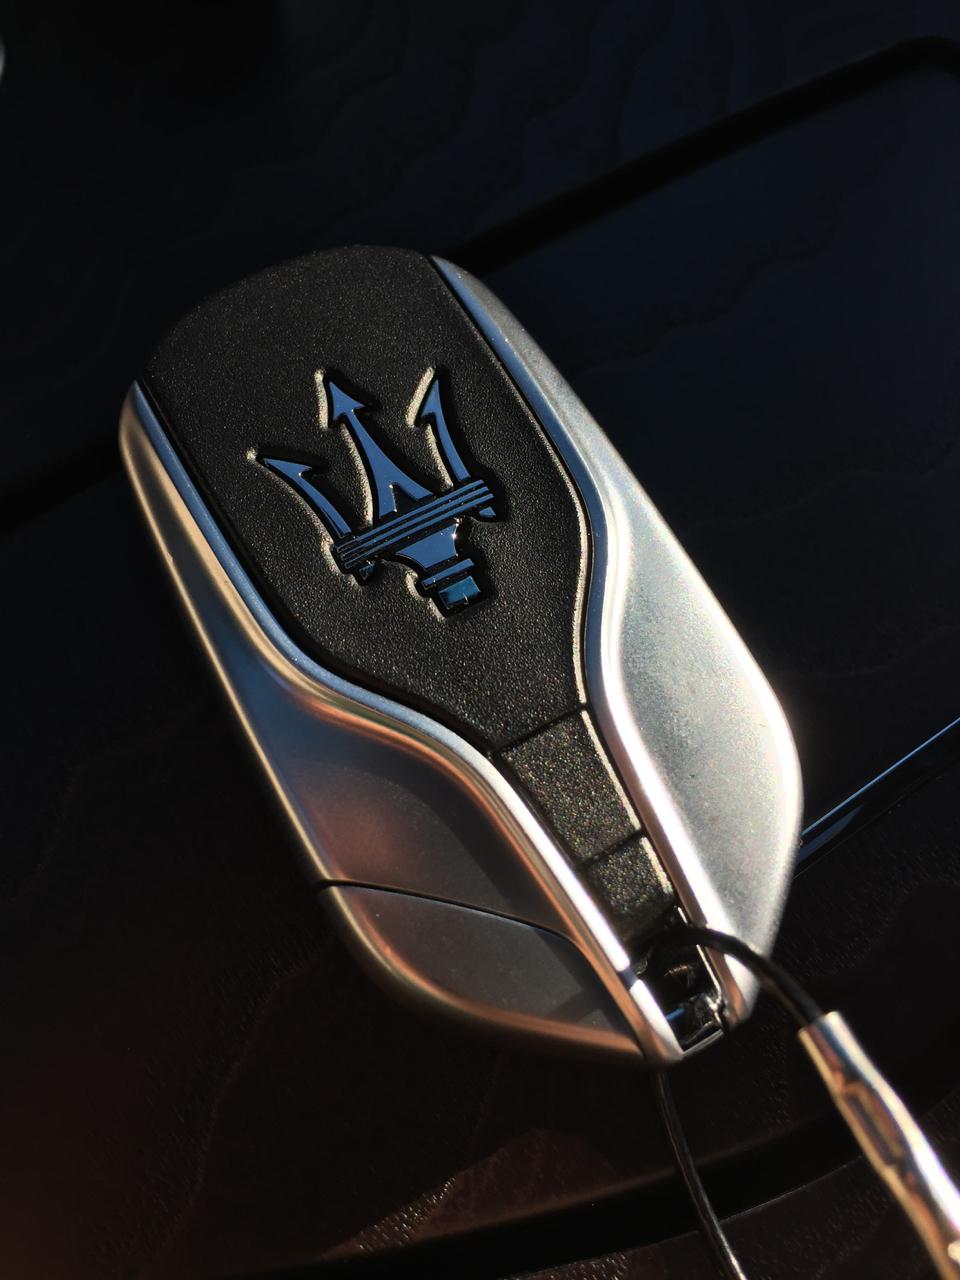 National Premier Selection Maserati Ghibli S Q4 Palo